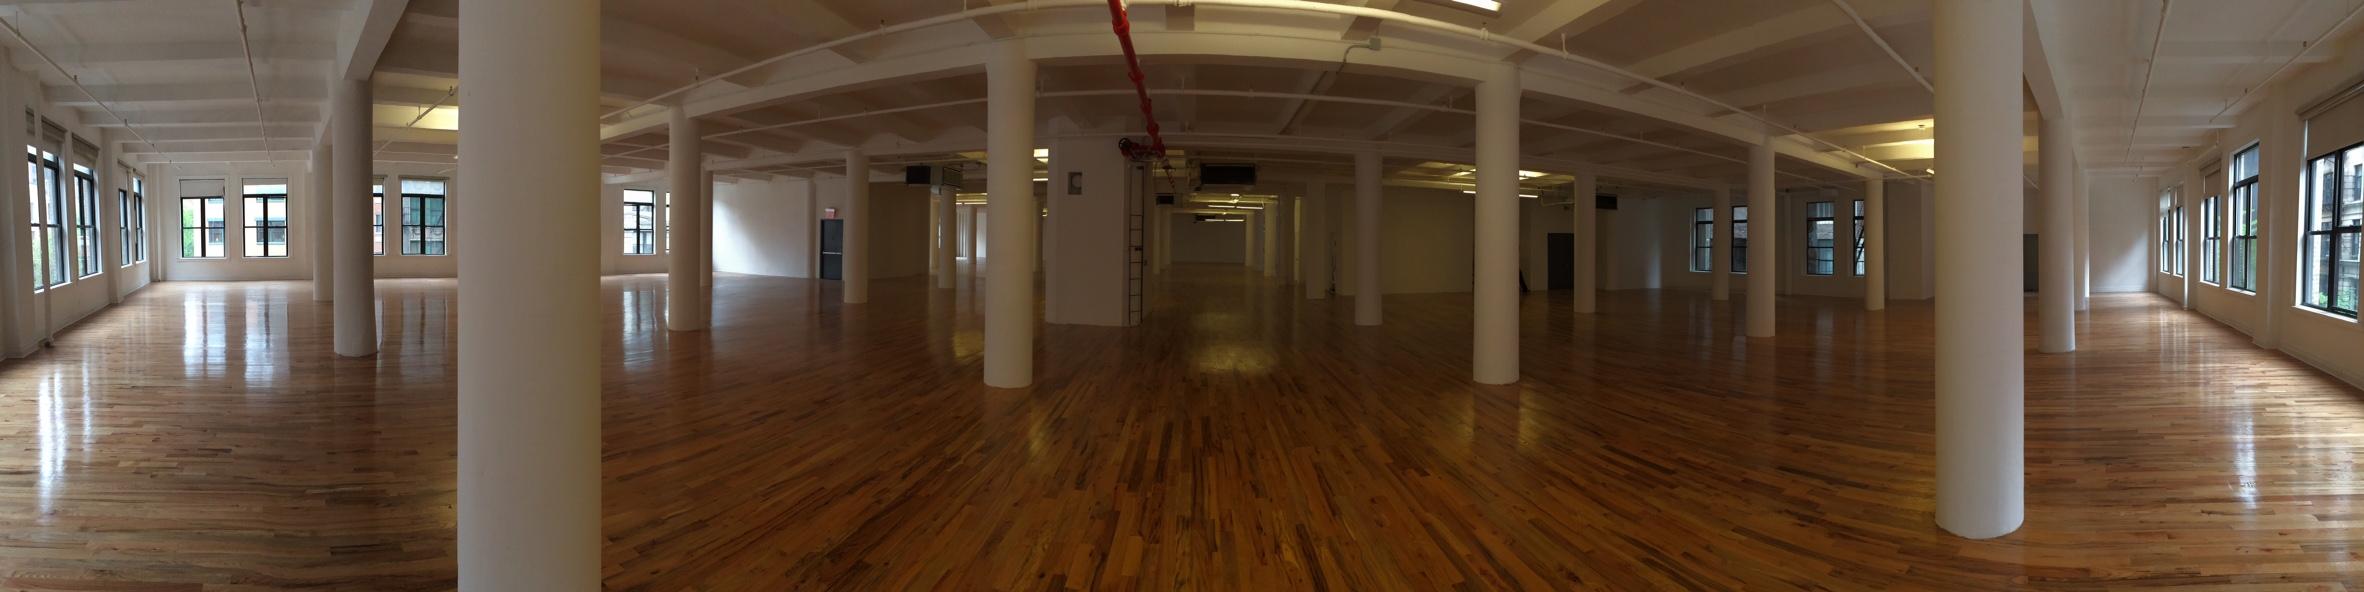 200-3rd-floor-2.JPG